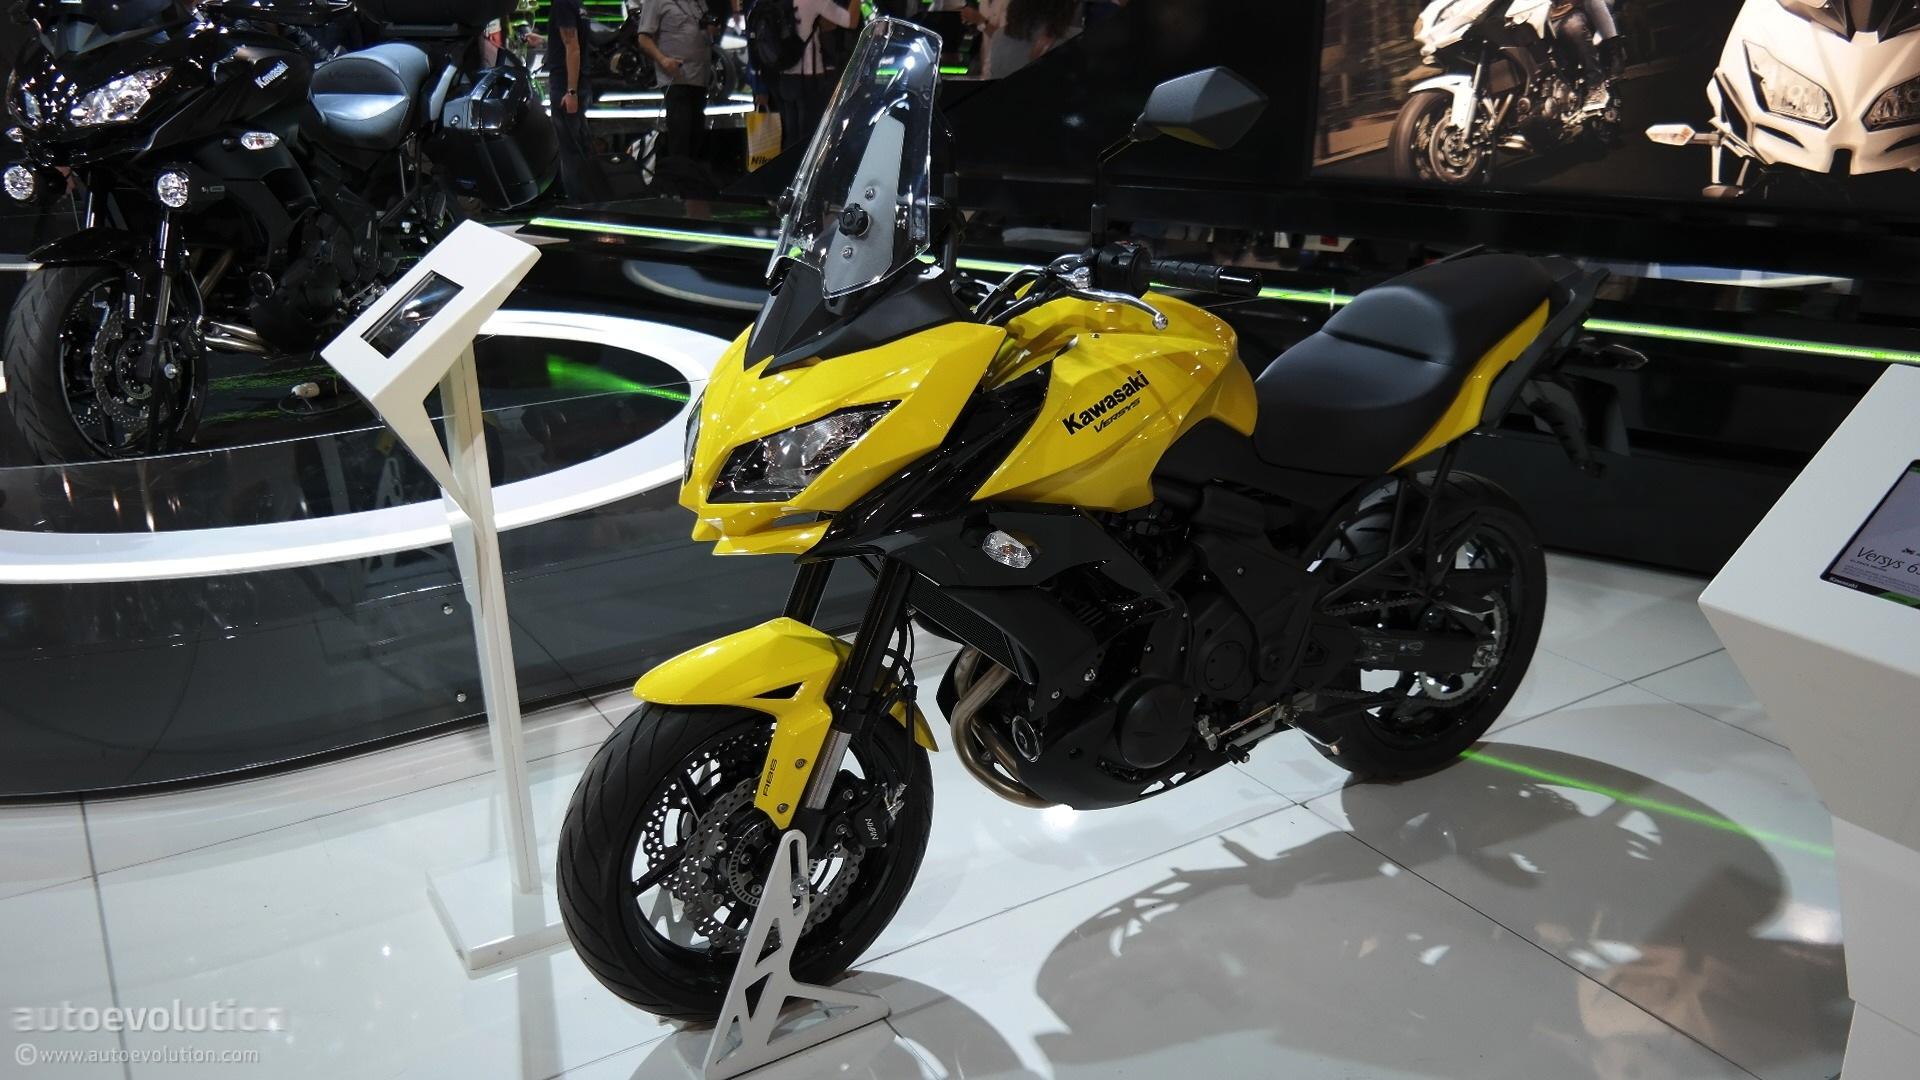 2015 Kawasaki Versys 650 LT Review | True 'Light Touring'